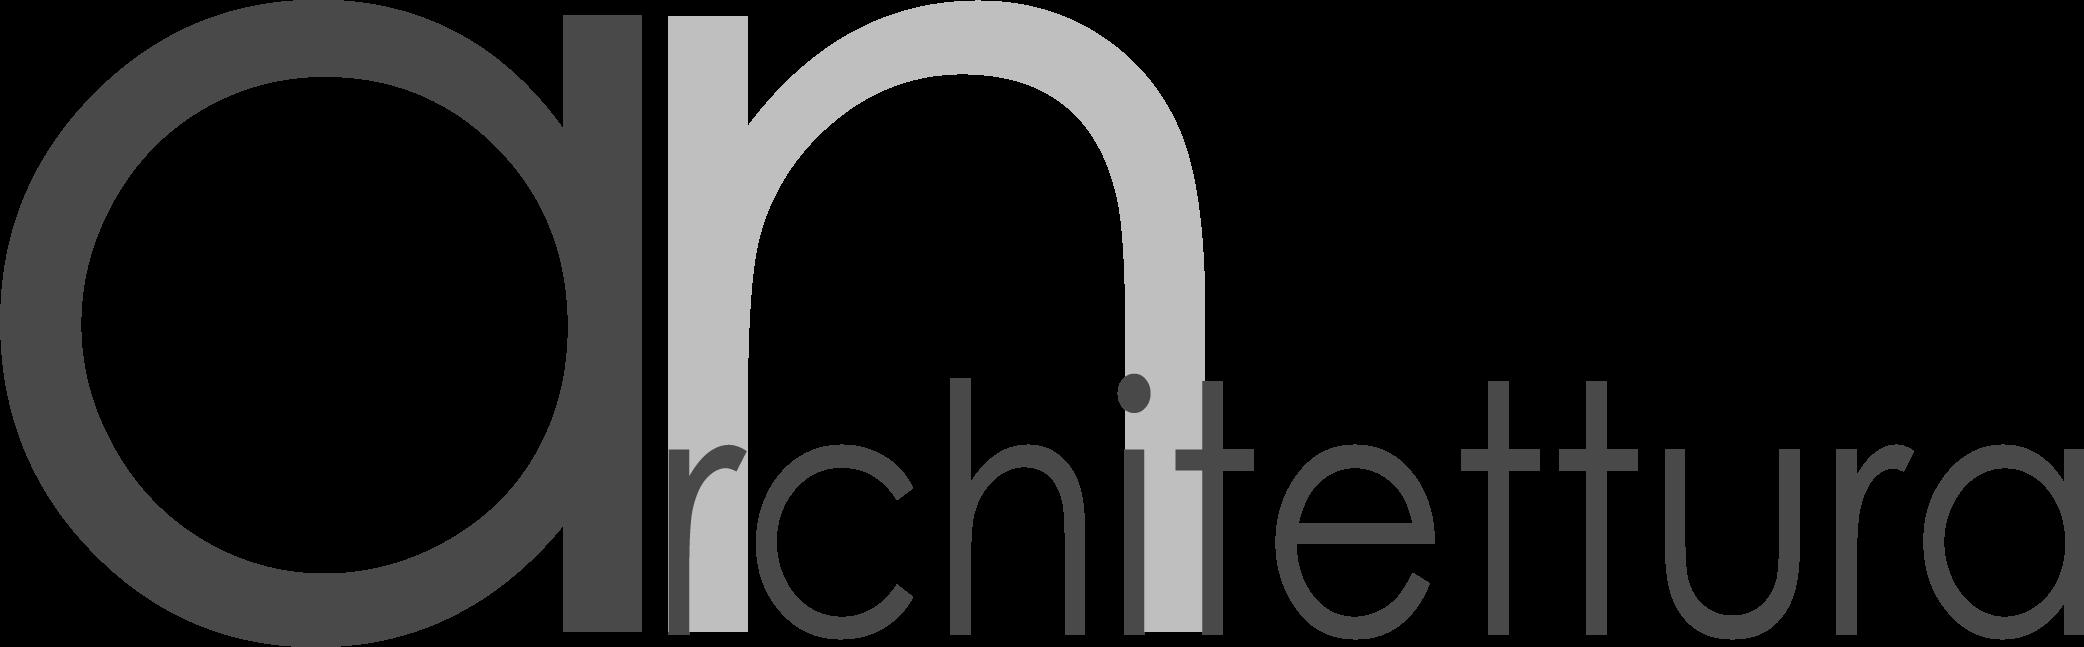 AN ARCHITETTURA